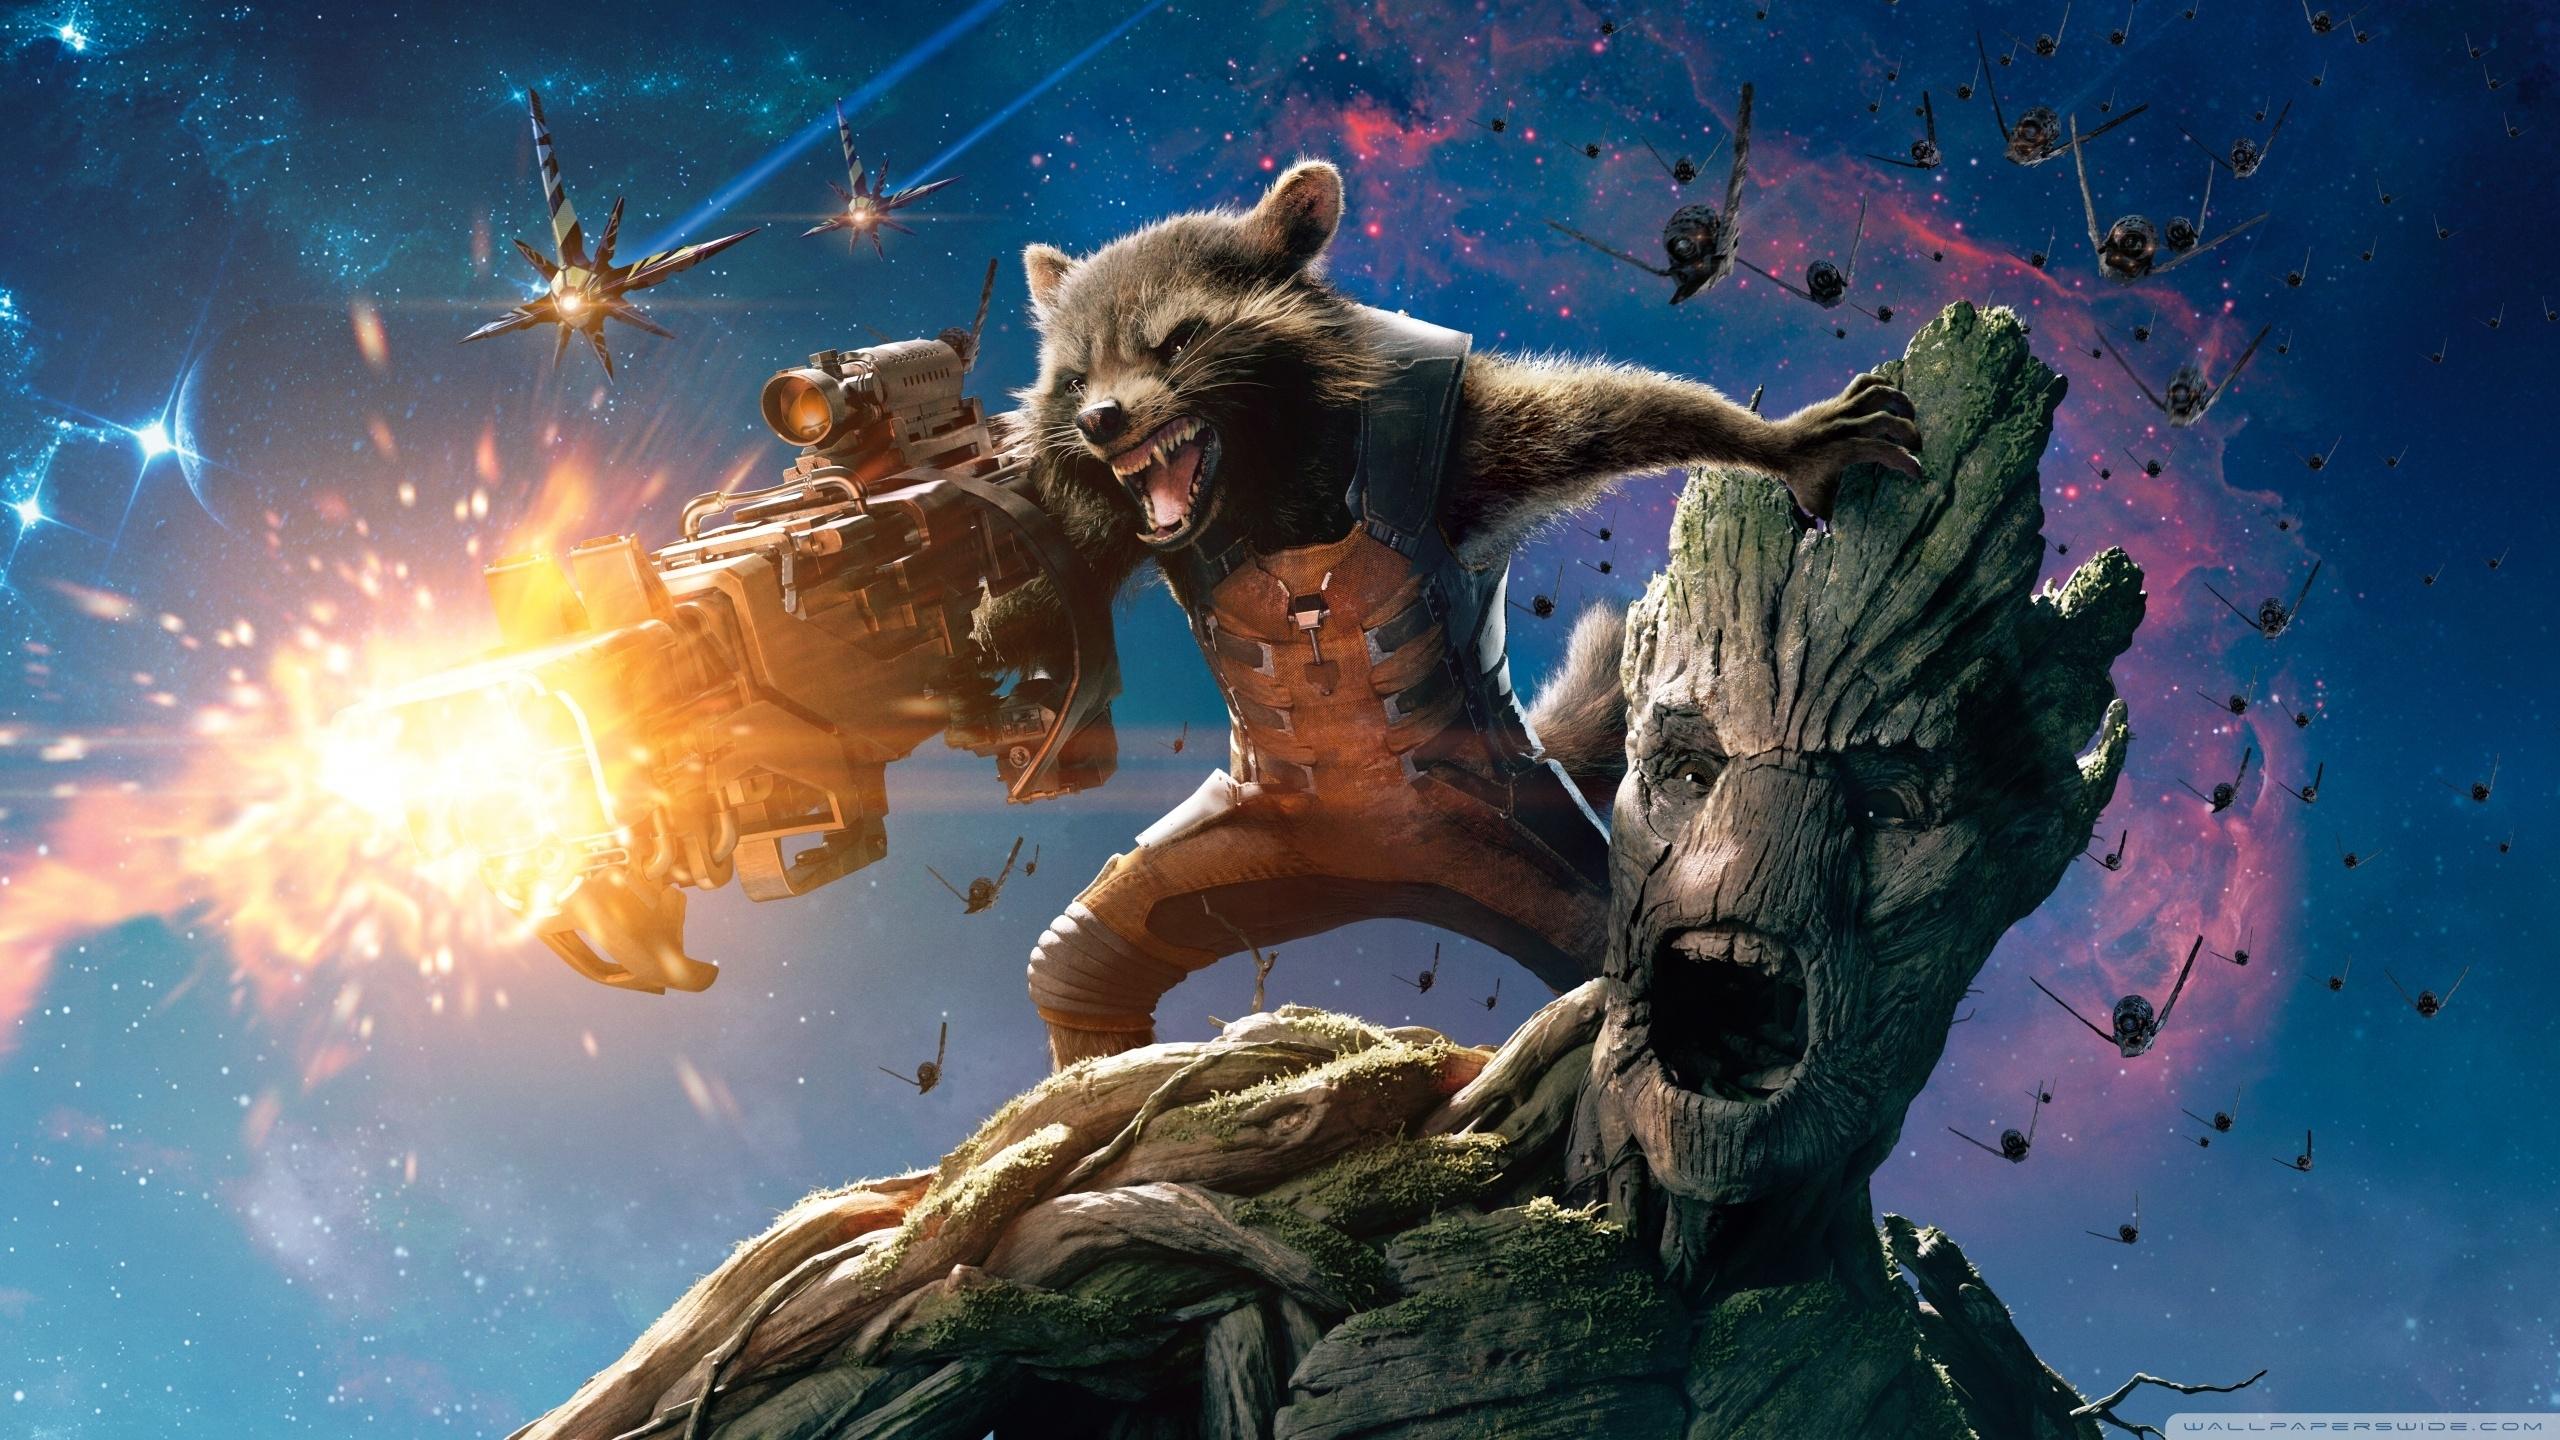 guardians of the galaxy groot and rocket raccoon ❤ 4k hd desktop